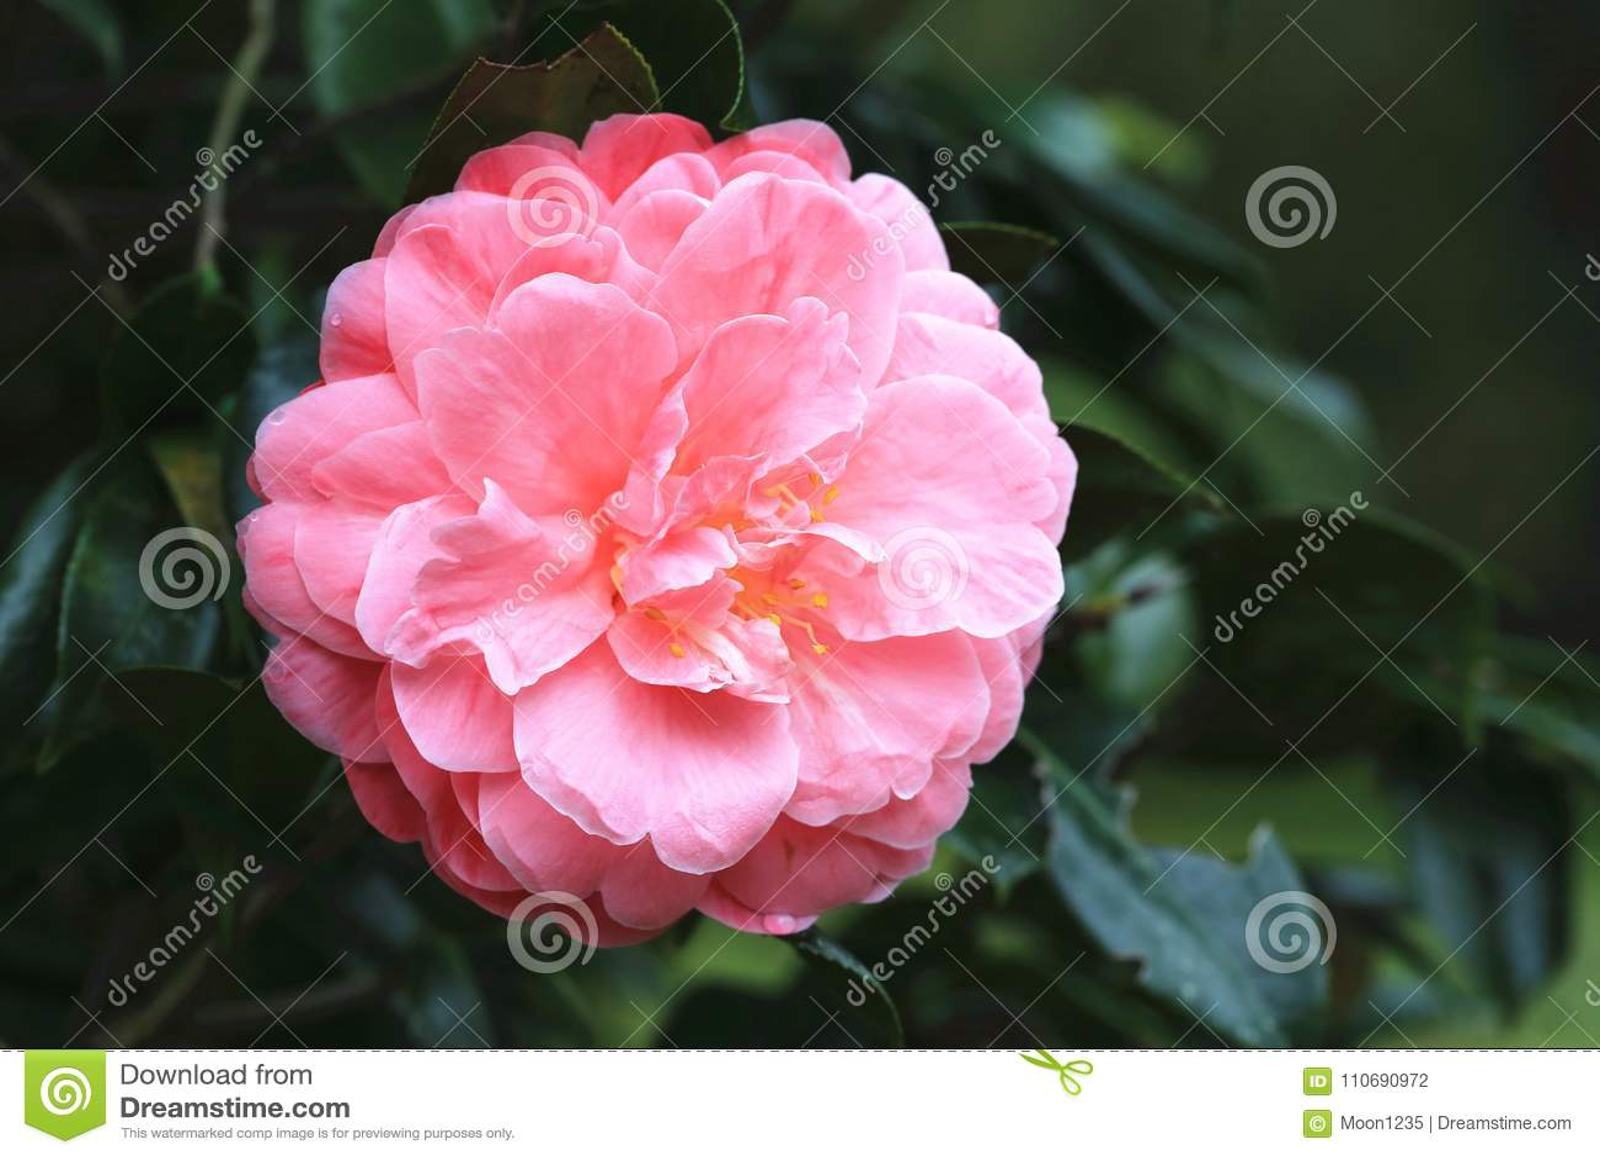 Pink Camellia Flower Closeup Stock Photo Image Of Flora Fragrant